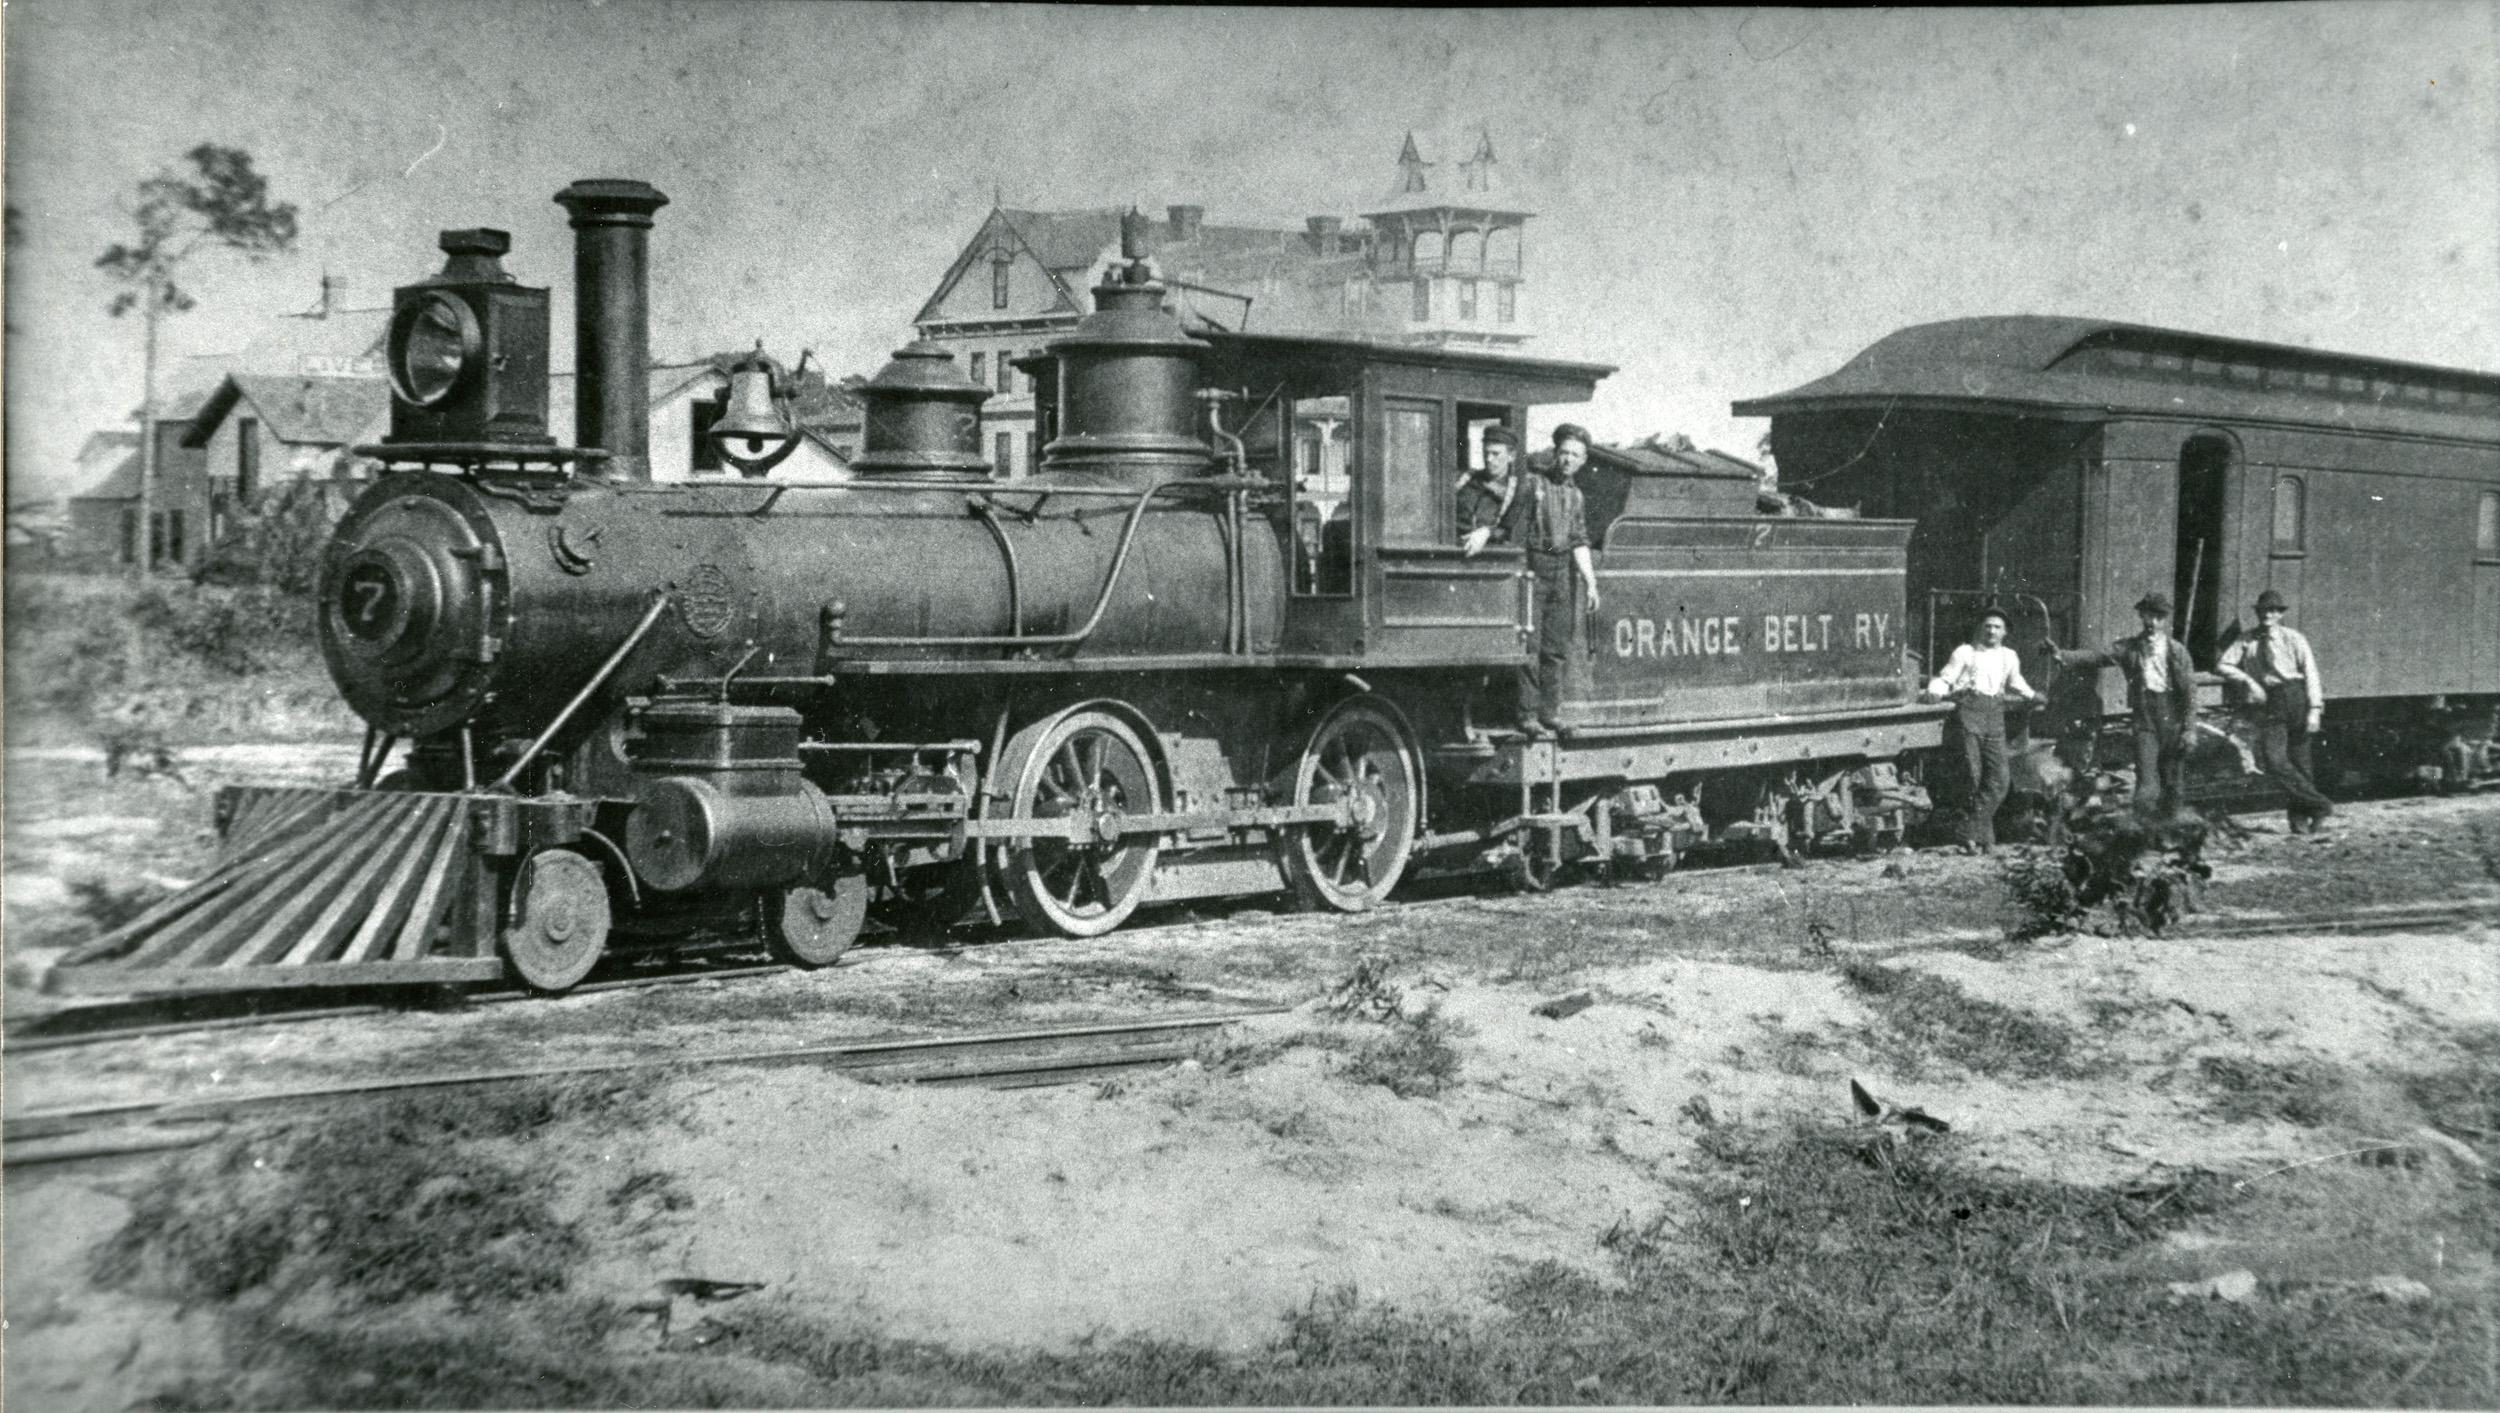 Orange Belt Railway 1888. From the St Petersburg Museum of History.